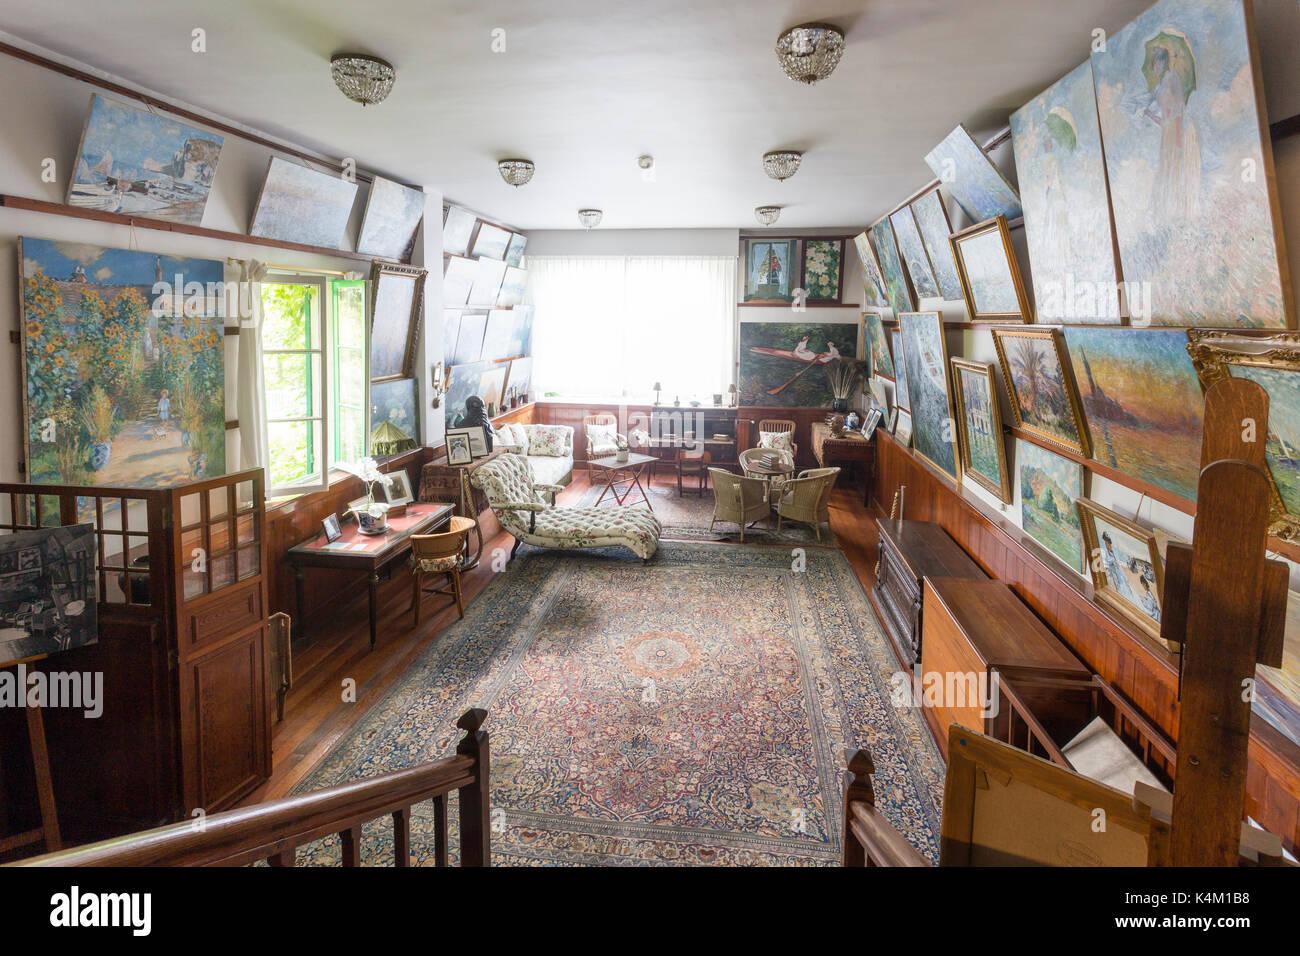 France, Eure (27), Giverny, maison du peintre Claude Monet, l'atelier // France, Eure, Giverny, house of the painter Claude Monet, the painter's studi - Stock Image